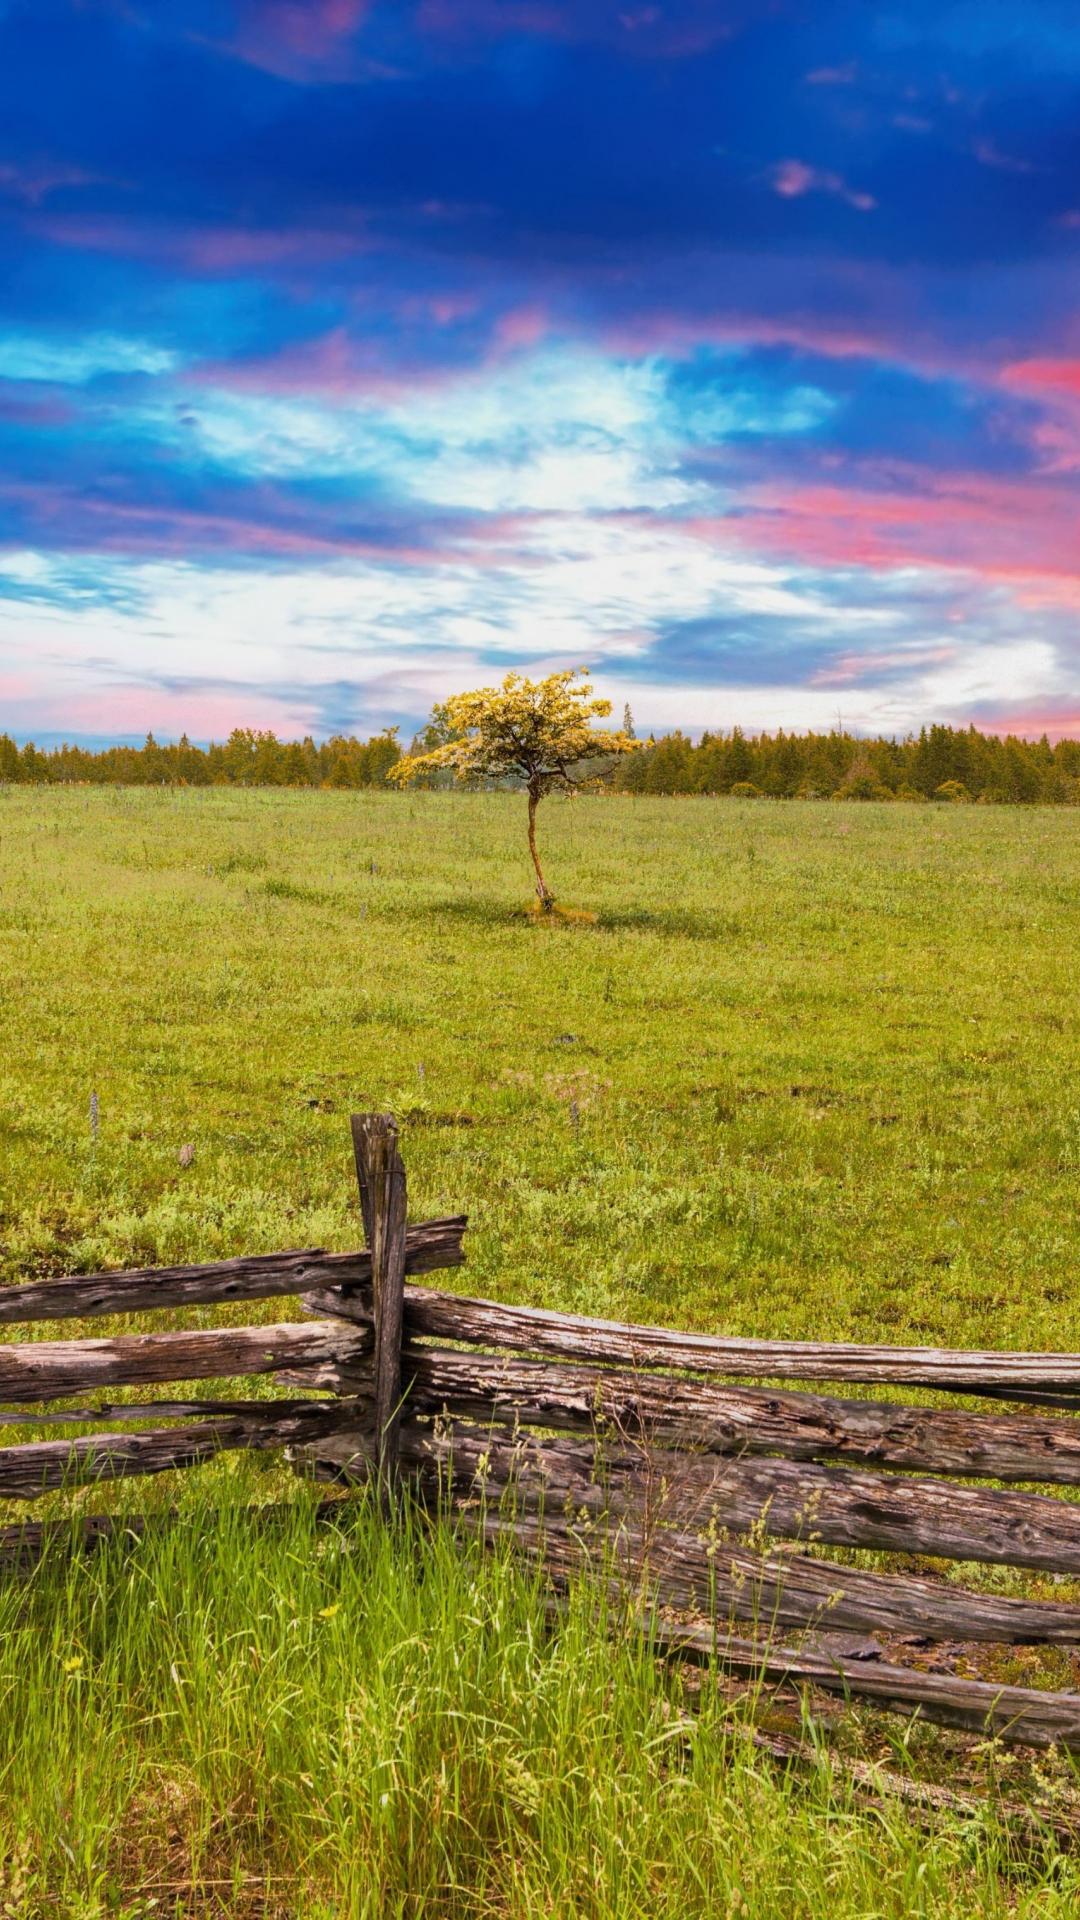 Downaload Wooden Fence Landscape Tree Skyline Nature Wallpaper